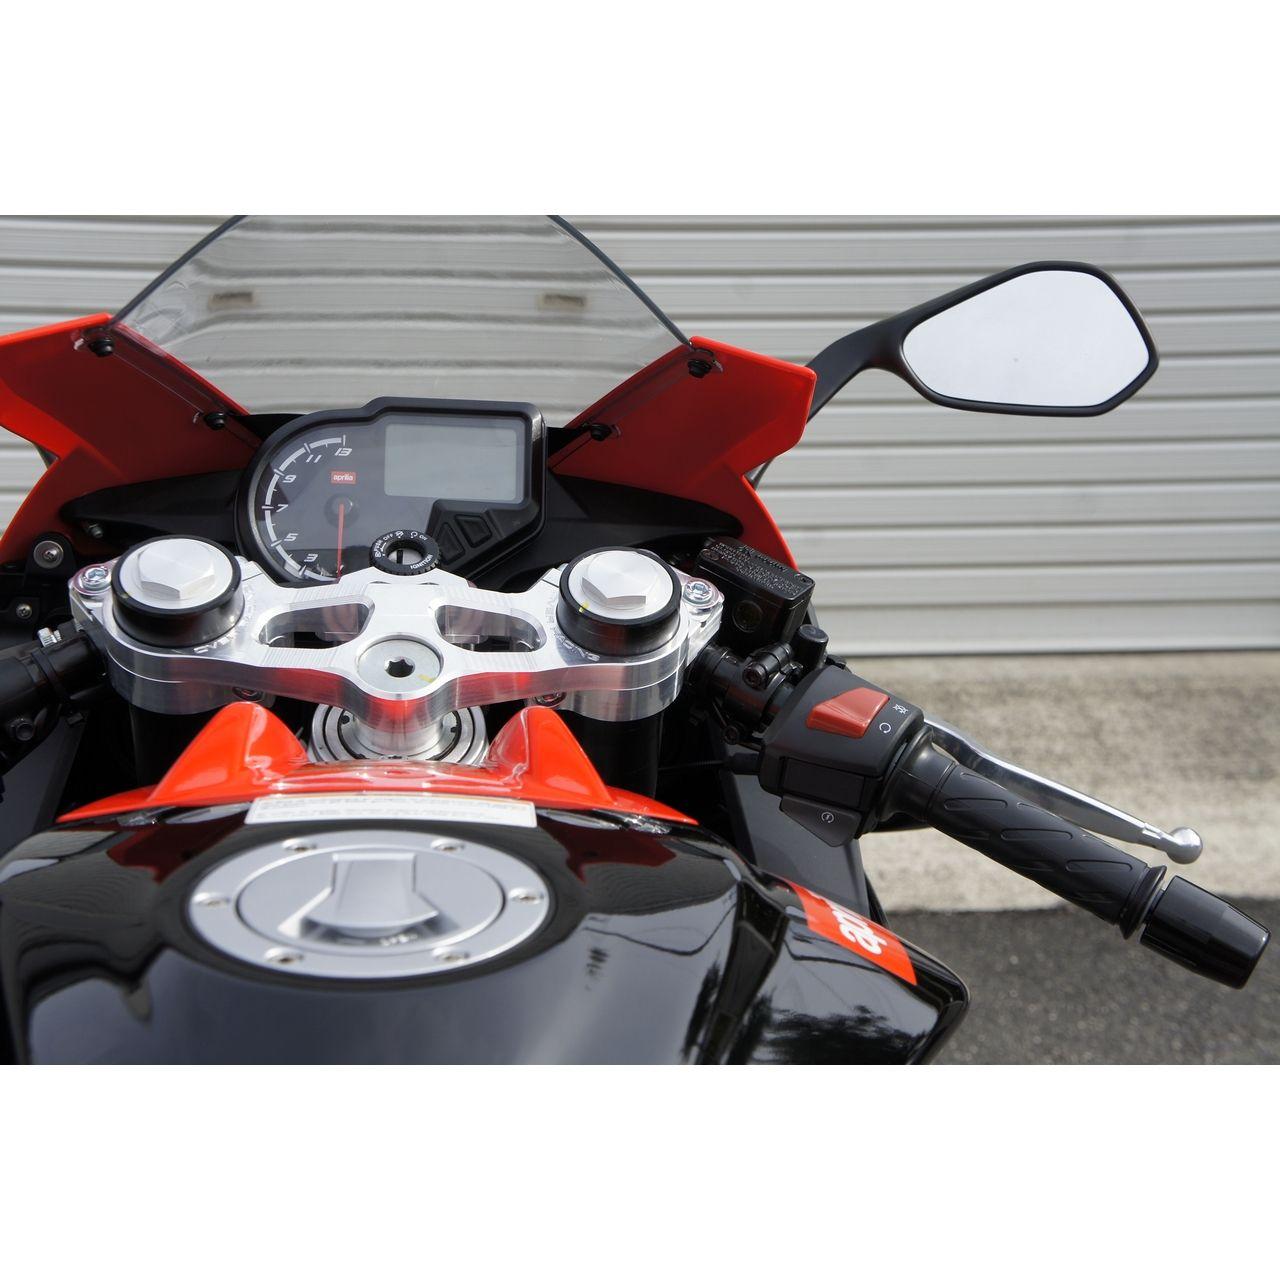 【OVER】Sports Riding 把手套件 - 「Webike-摩托百貨」